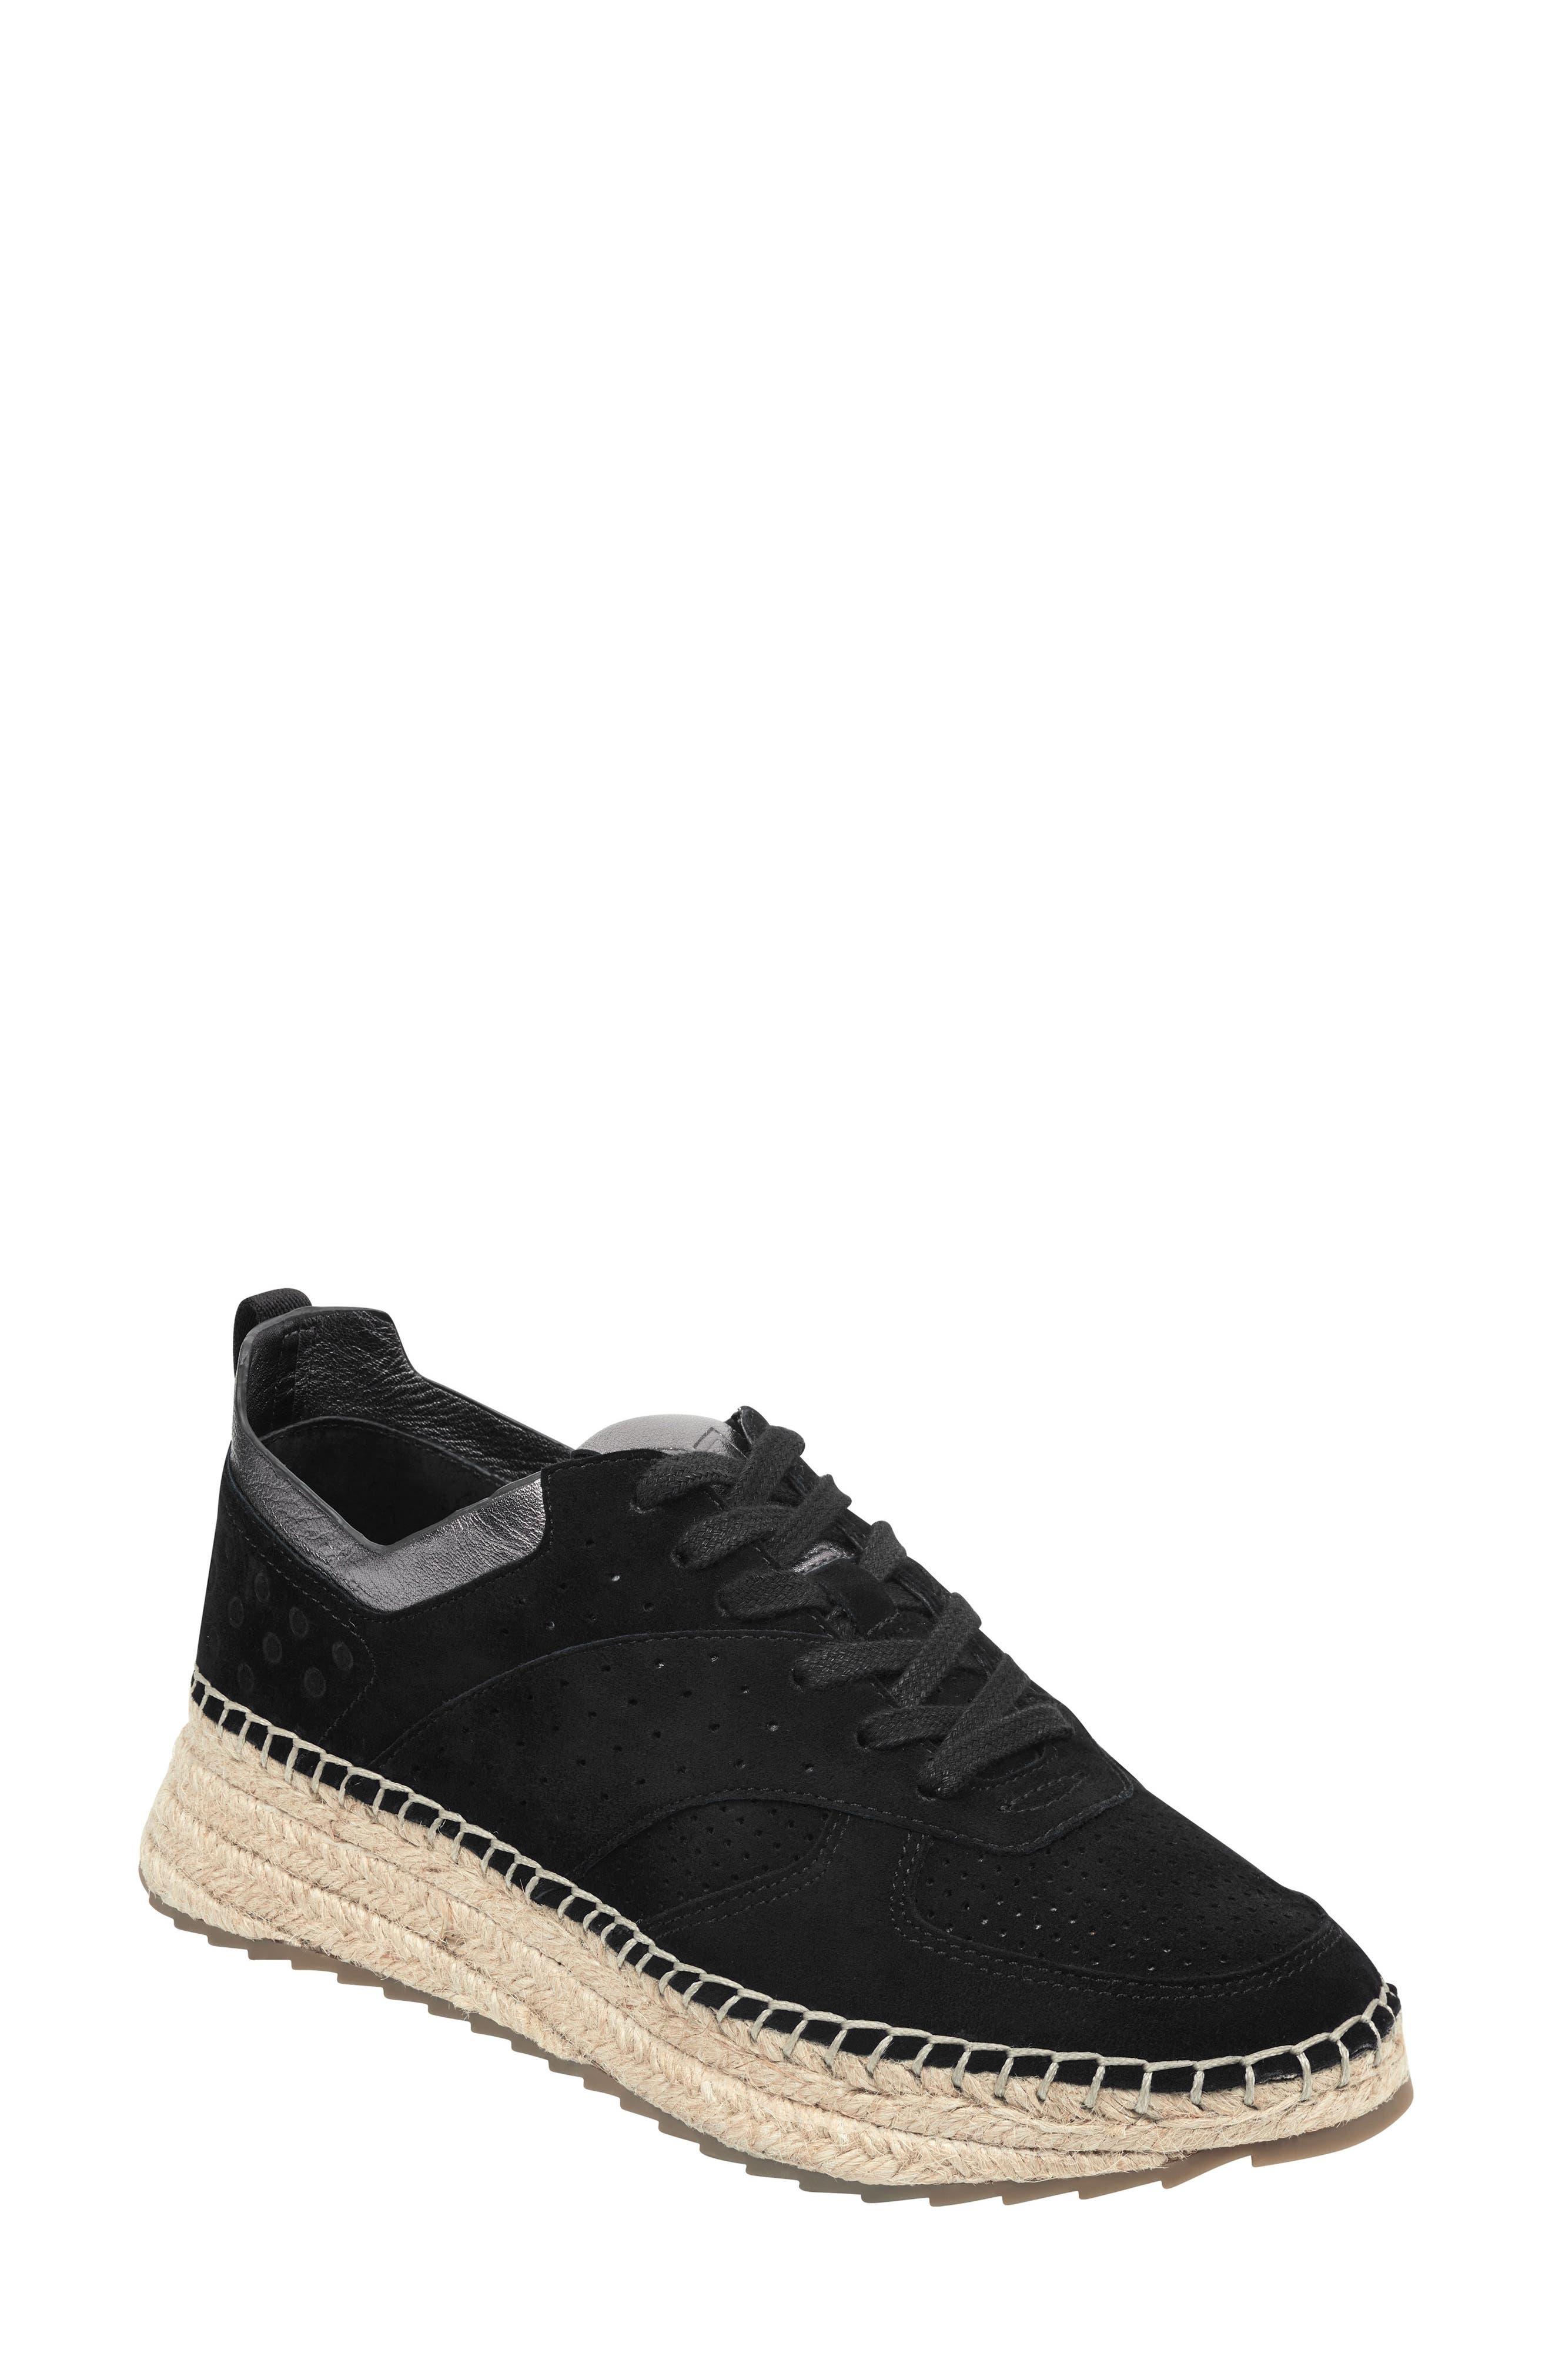 MARC FISHER LTD Julio Sneaker, Main, color, BLACK SUEDE